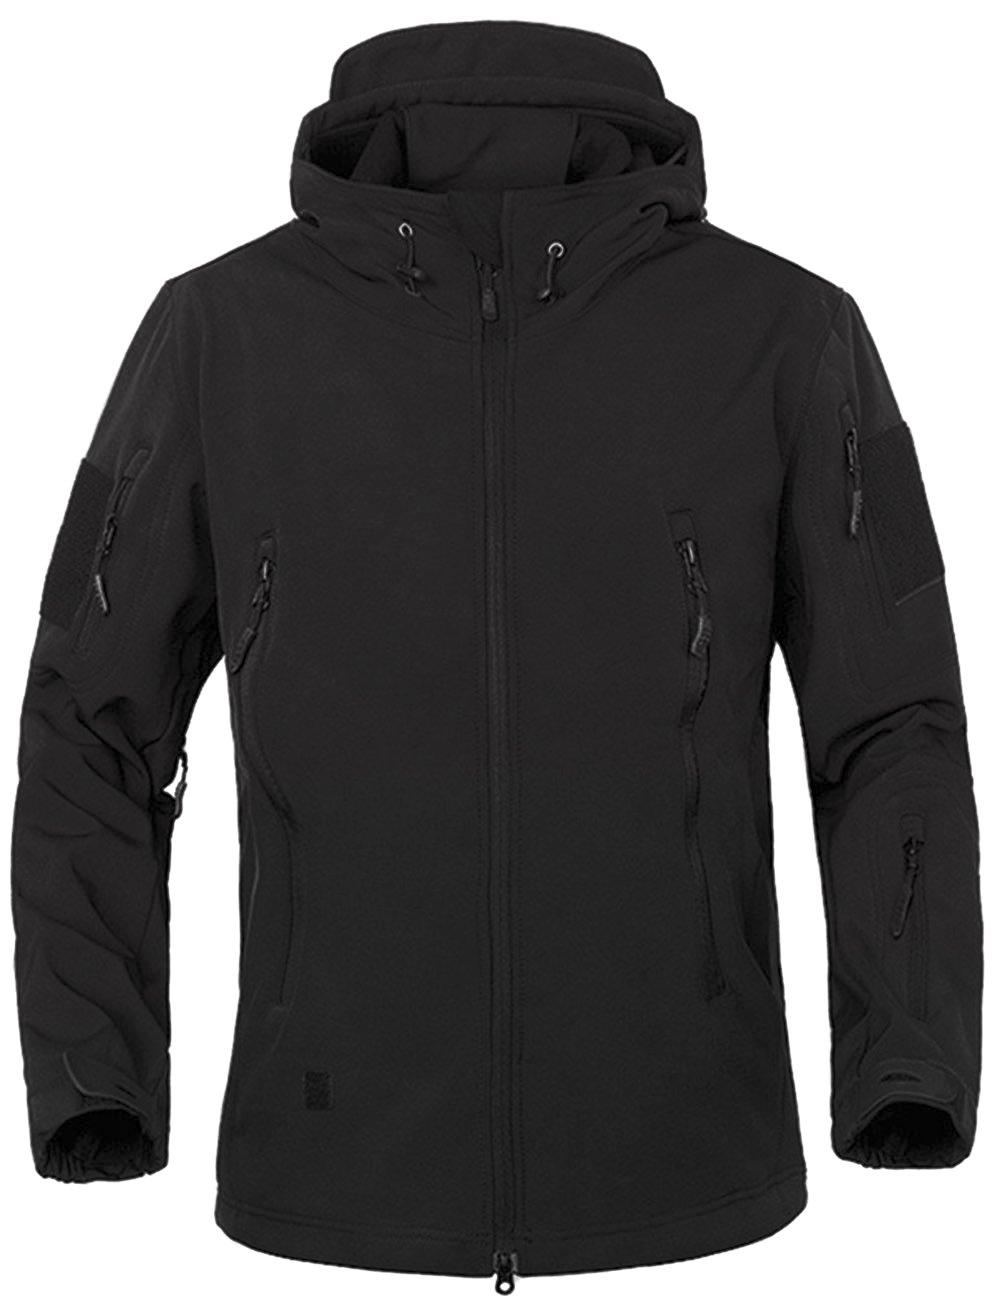 87df0086fa0b6 TACVASEN Military Waterproof Men's Softshell Jacket Fleece Lining Camouflage  Outdoor Coat: Amazon.co.uk: Sports & Outdoors